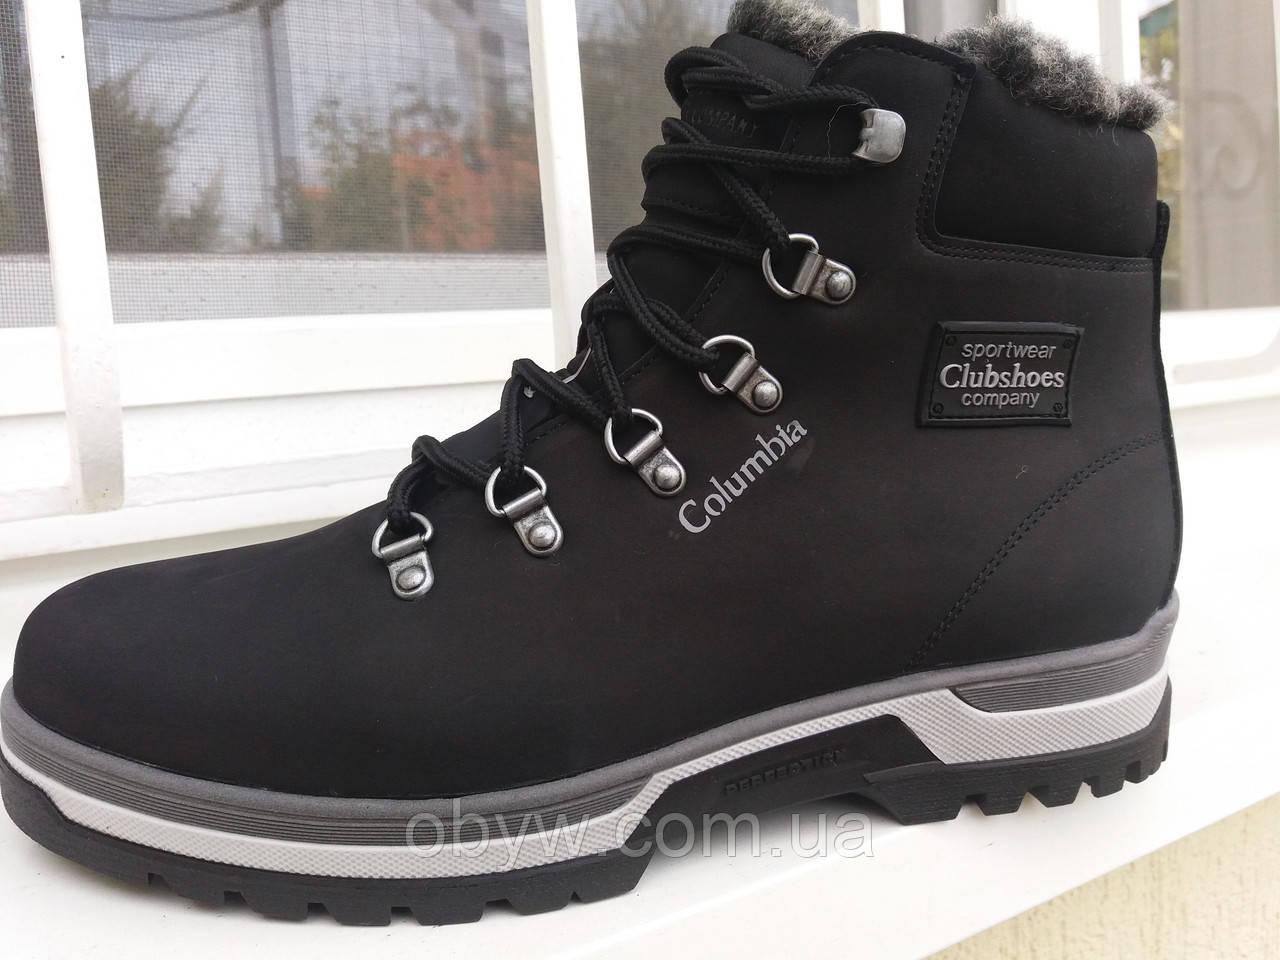 Утеплённые ботинки Calambia